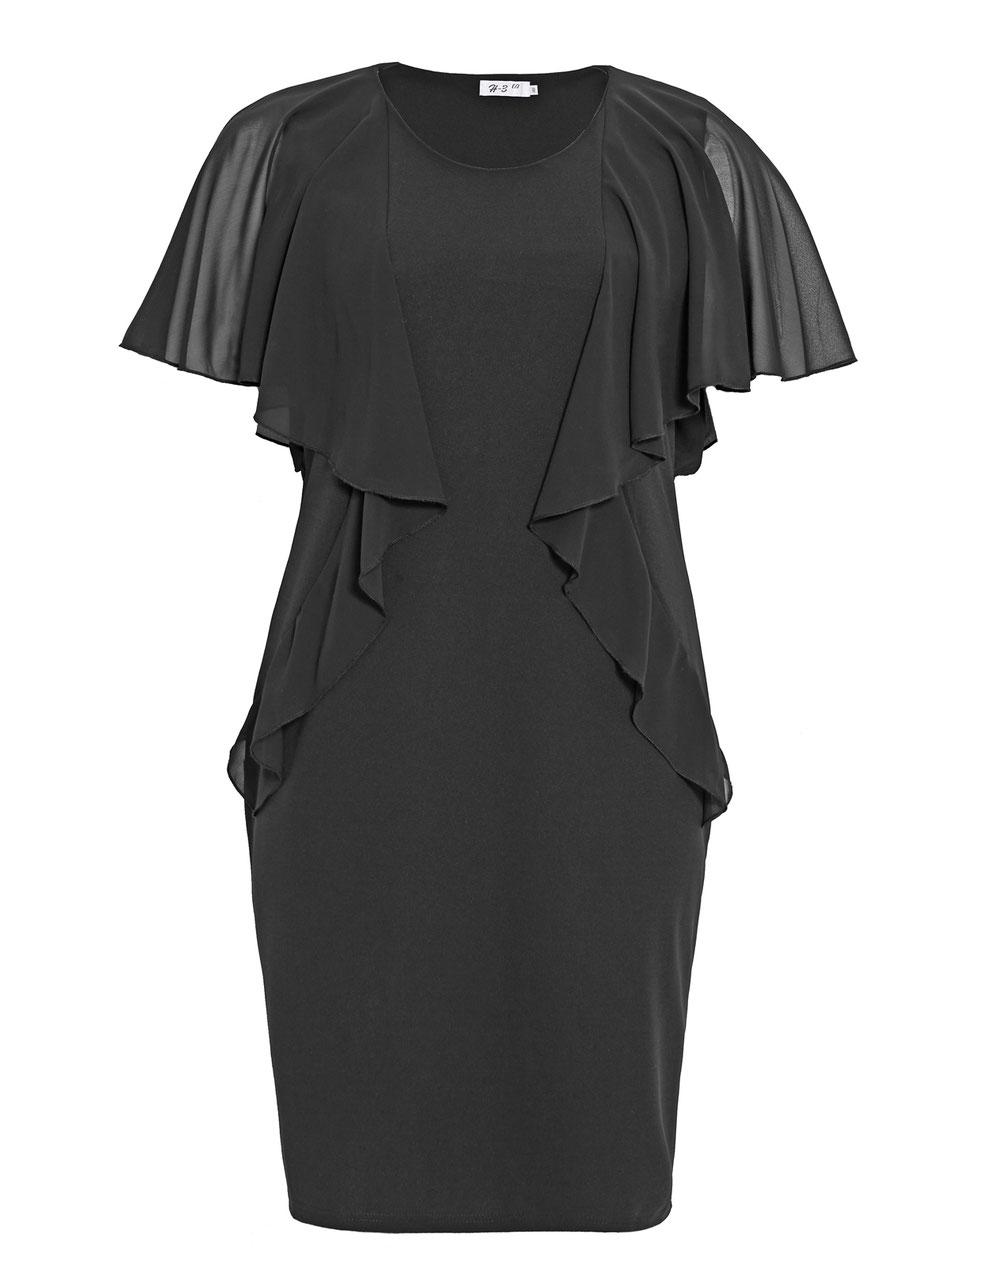 Elegantes schwarzes Kleid - Mypepita.com